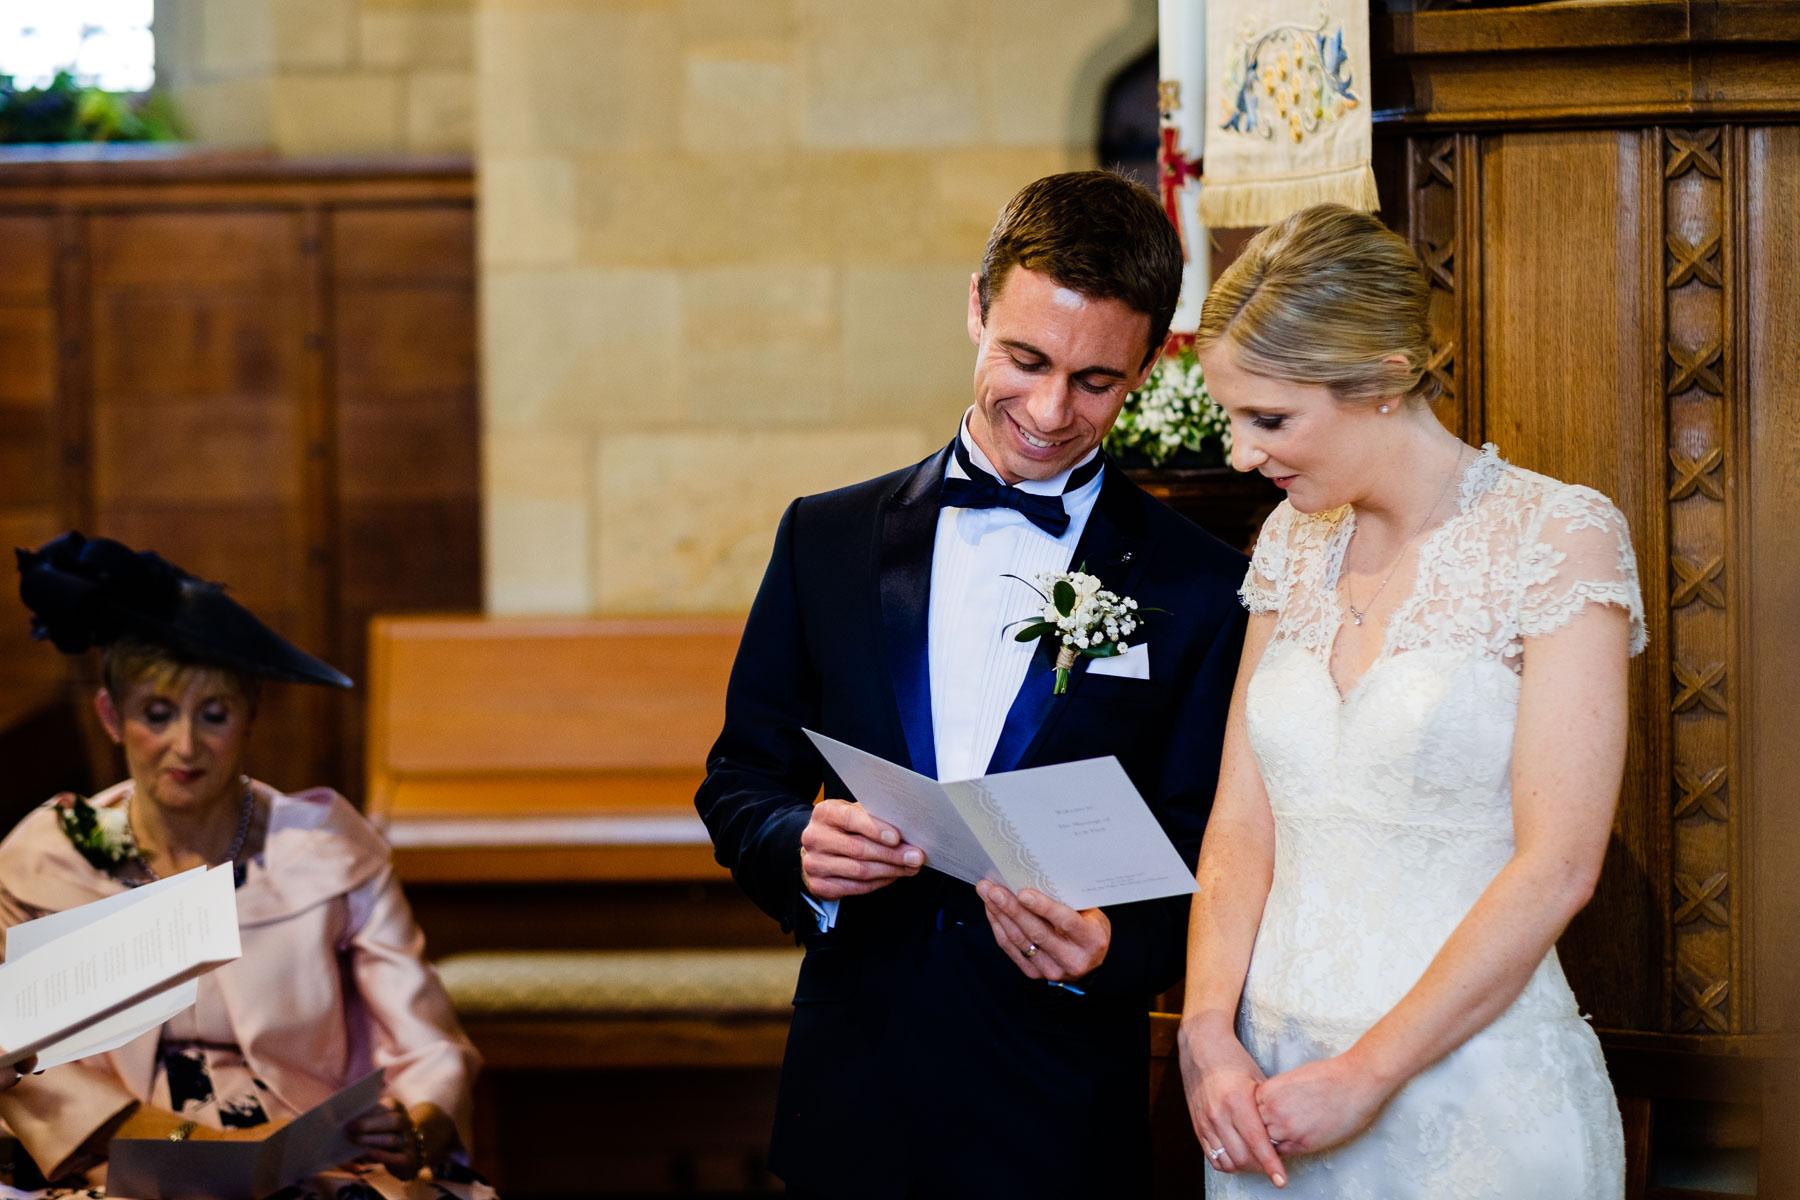 Crathorne Hall Wedding Photography - Jo & Paul (103).jpg